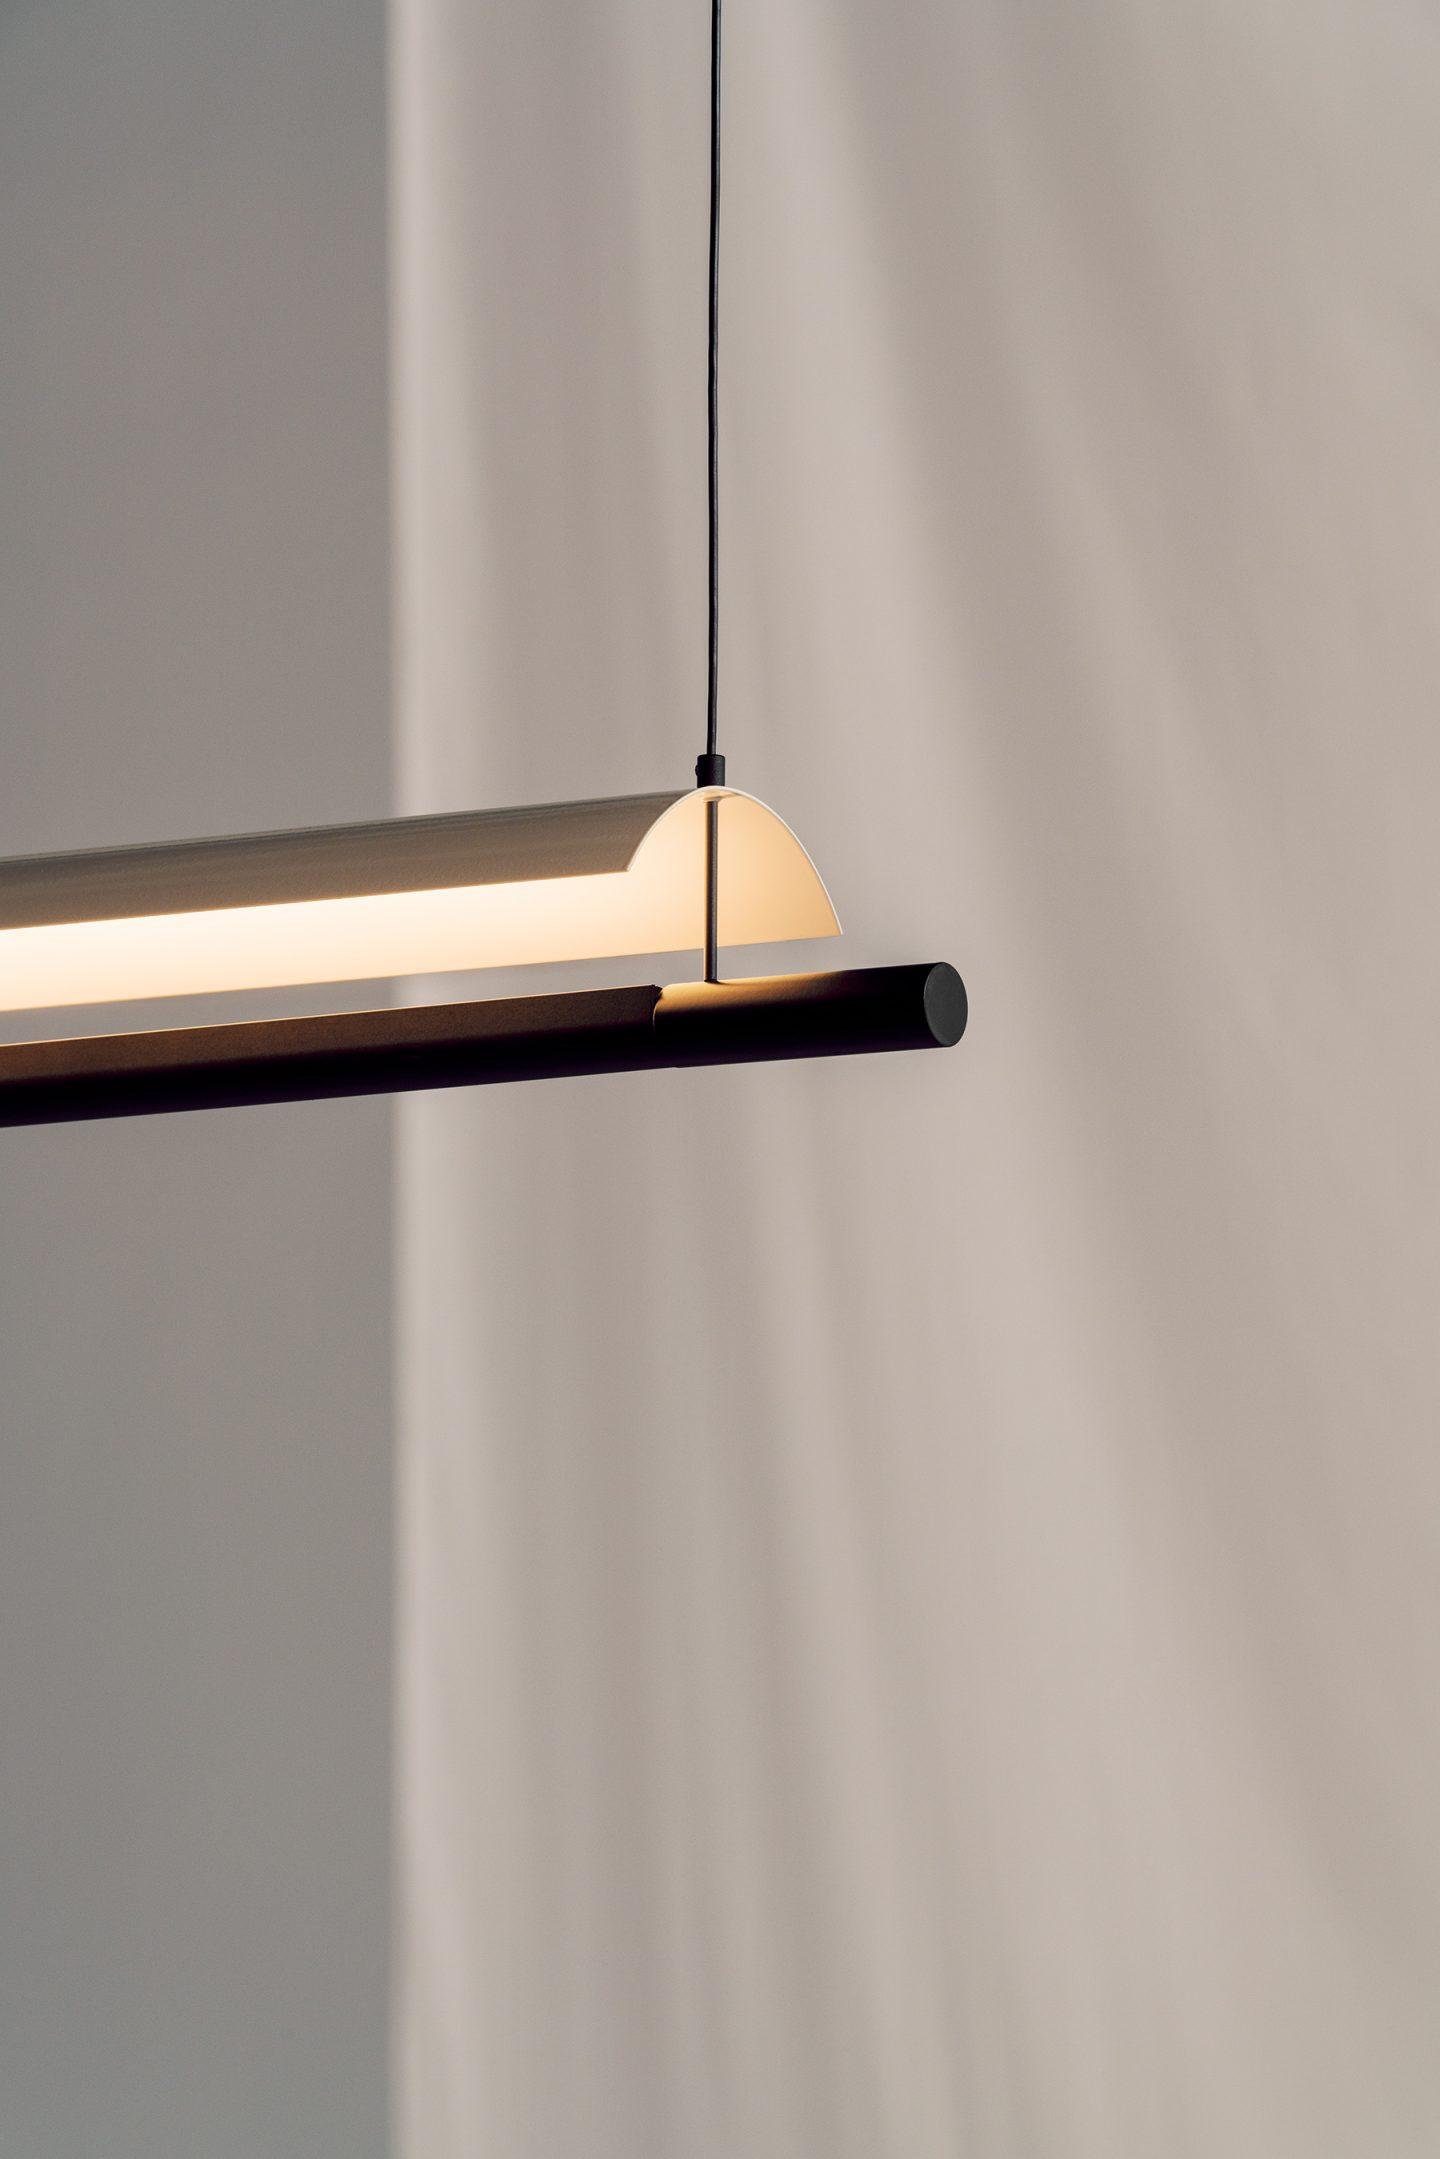 IGNANT-Design-SantaCole-AntoniArola-Lamina-11